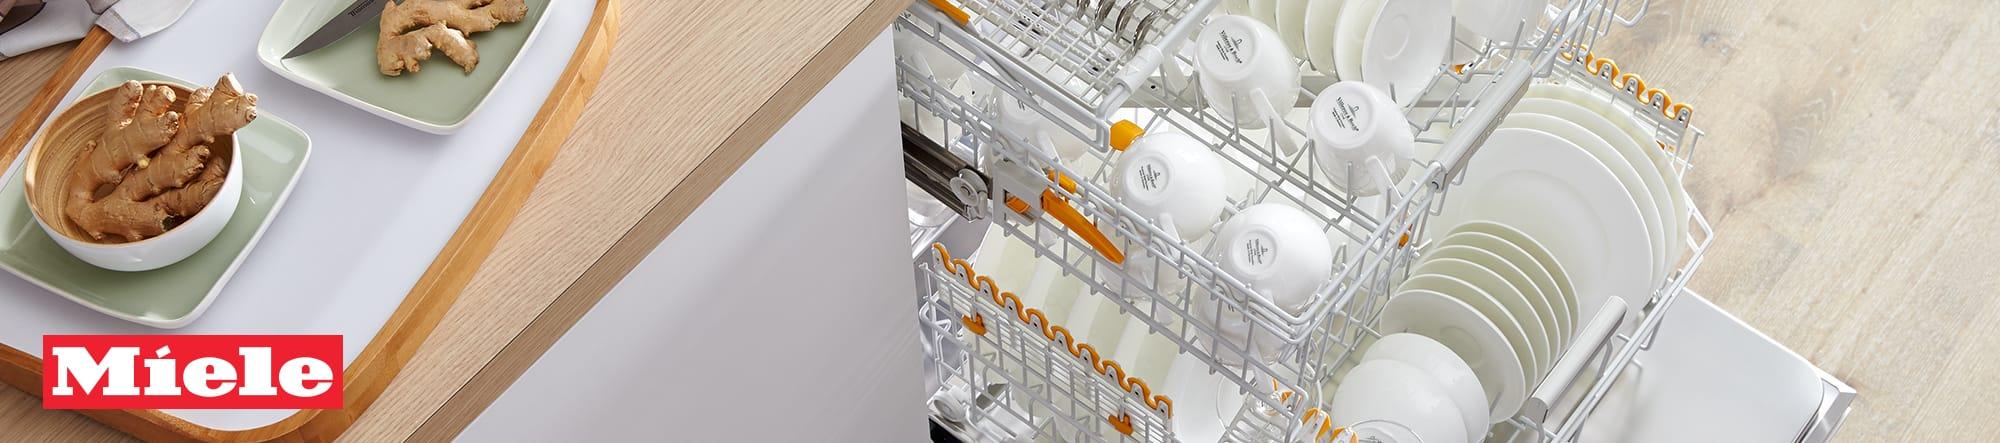 Miele 100 off Select Dishwashers Appliance Financing & Appliance ...